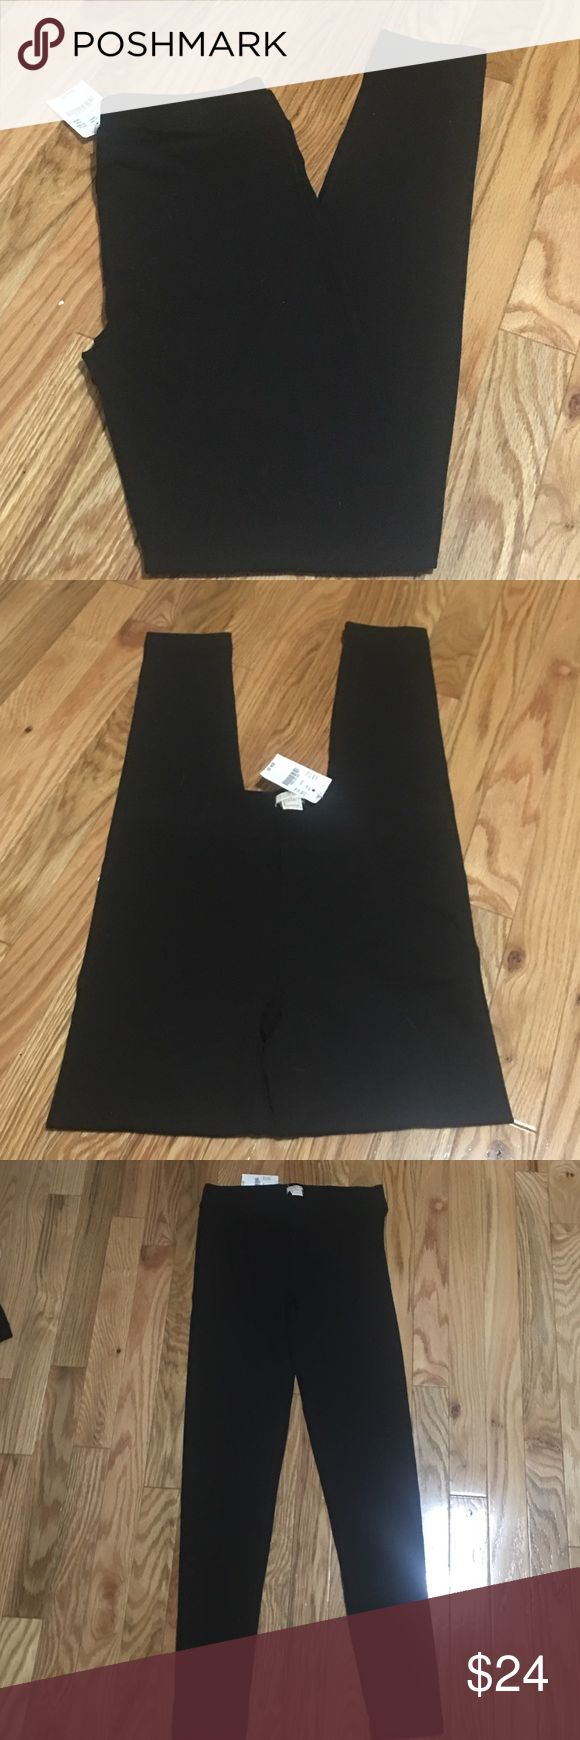 J.Crew black legging Size XXS J.Crew Black leggings style# 51023. J. Crew Pants Leggings